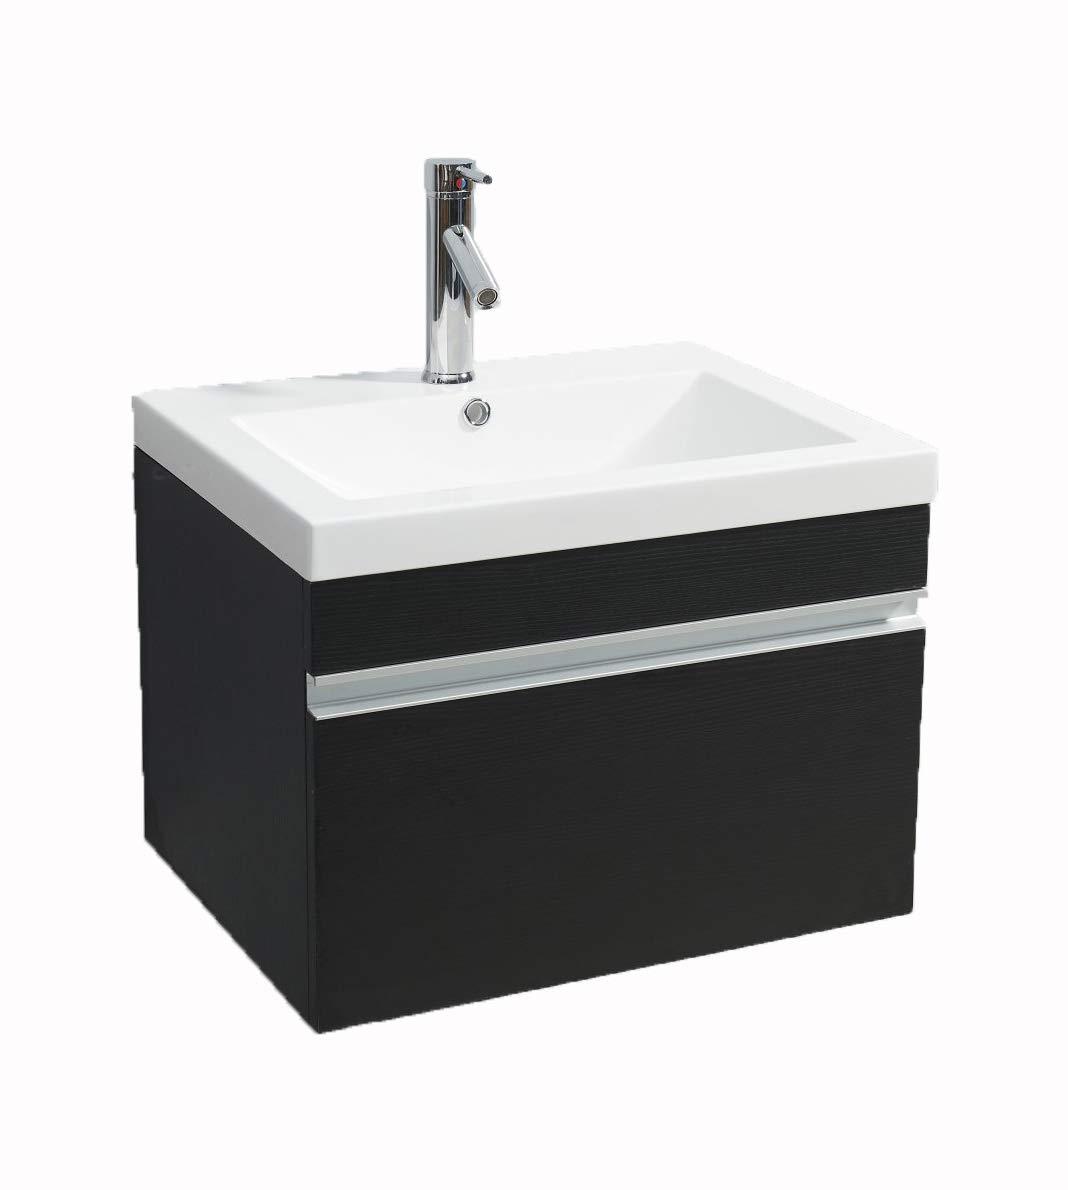 Vs alexius black vanity sink 24 inch floating wall hung mount bathroom modern contemporary corian one piece toilets amazon com